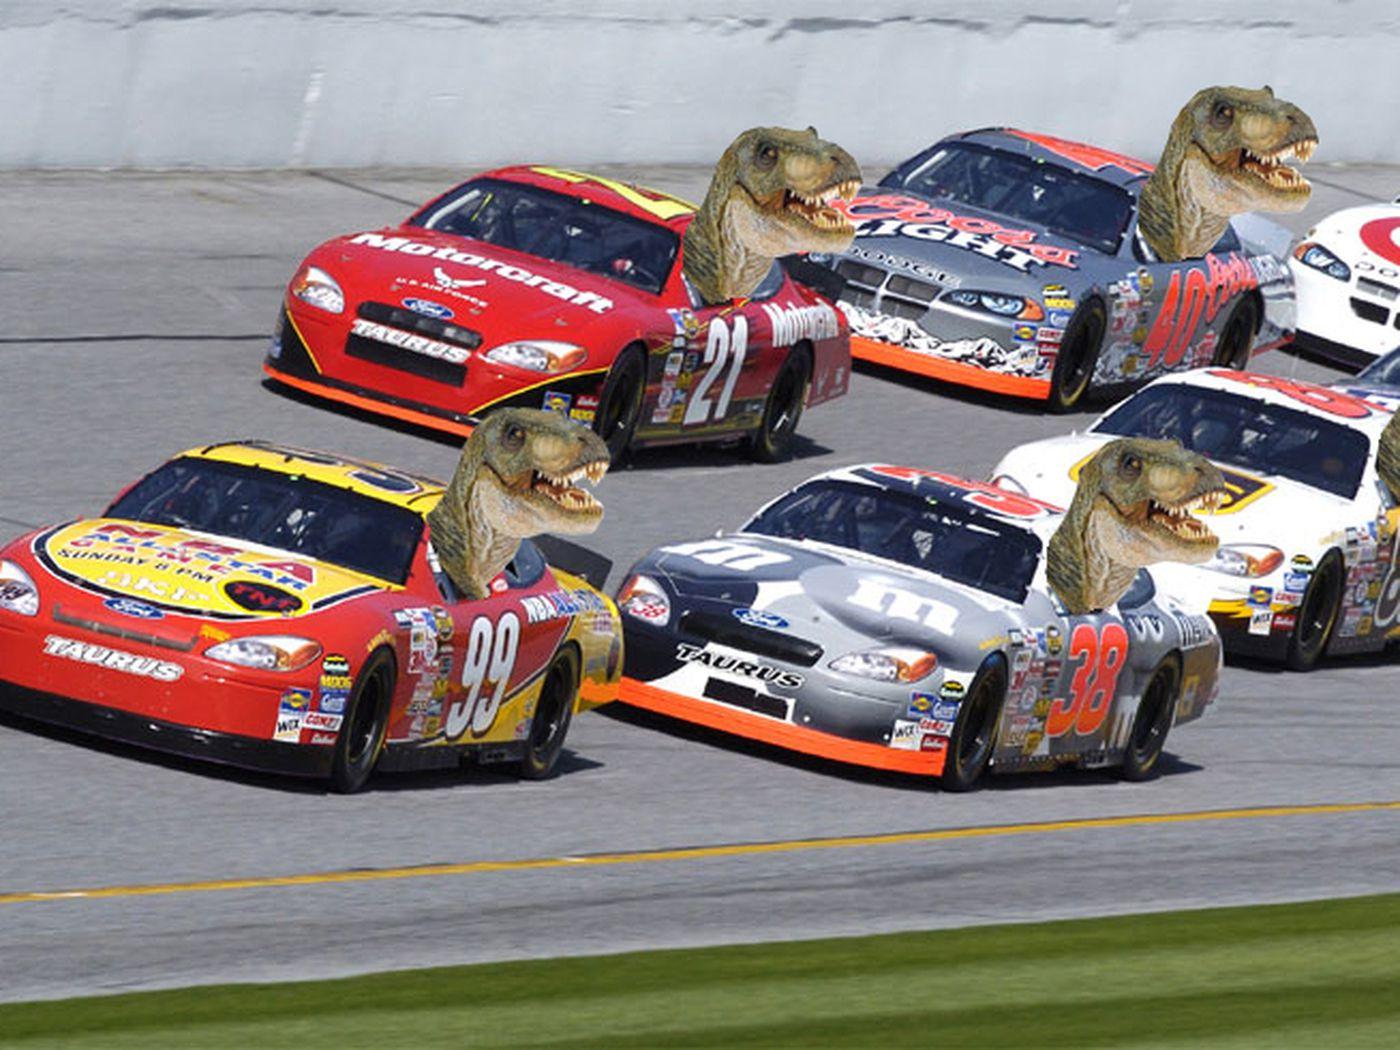 25 Dinosaur Car Track Toys For Kids 2 Big Loops Slot Race Sets